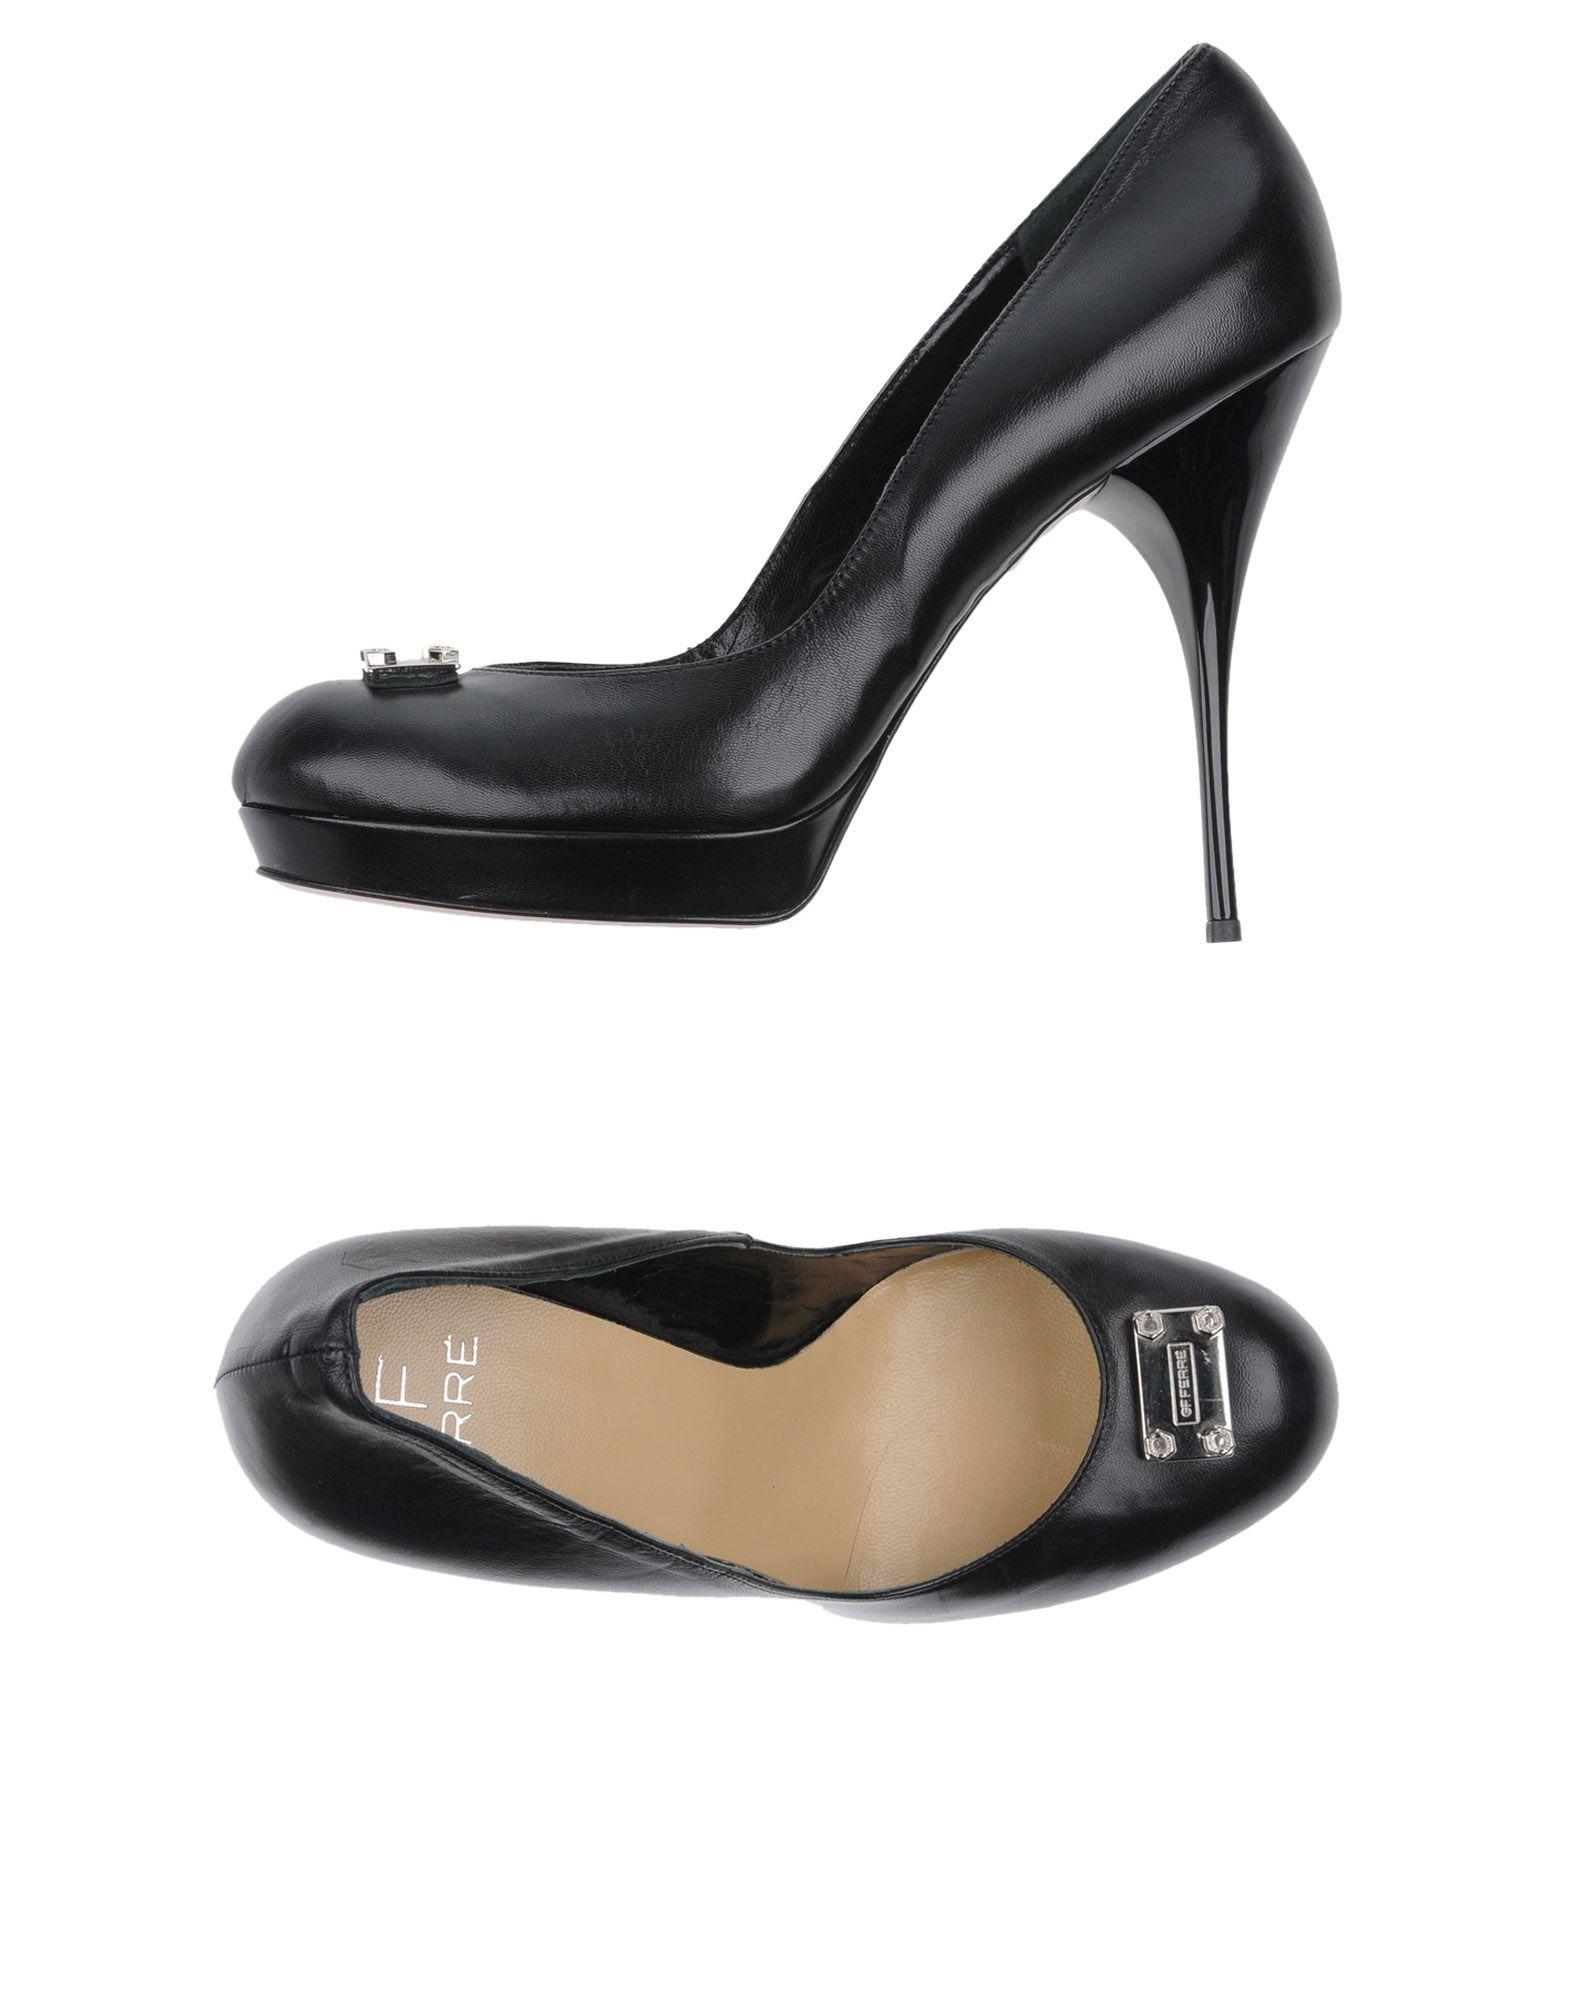 Stilvolle billige Pumps Schuhe Gf Ferre' Pumps billige Damen  11289717GI d2a46b